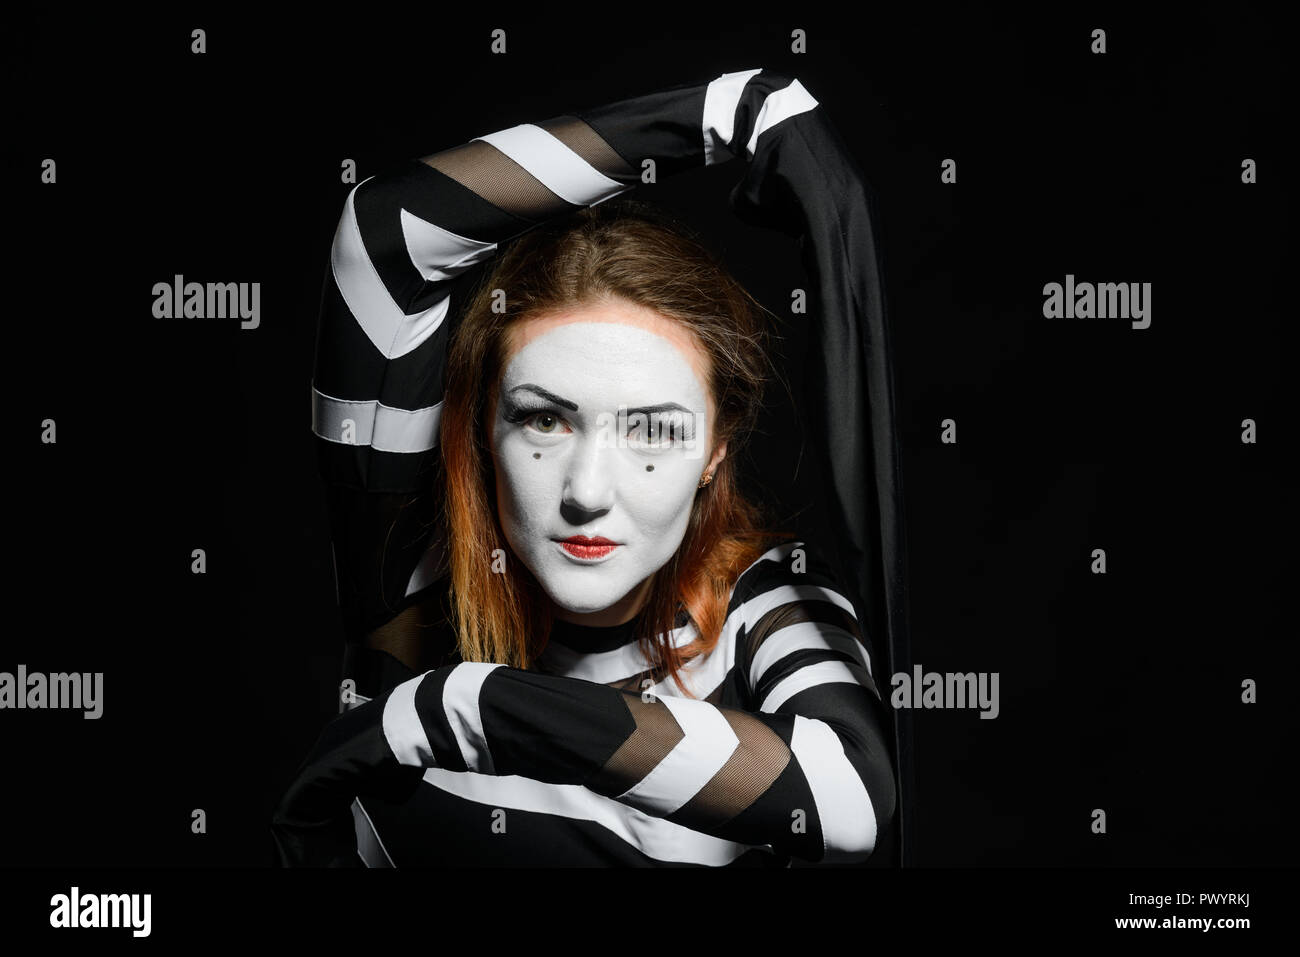 Portrait of female mime artist - Stock Image